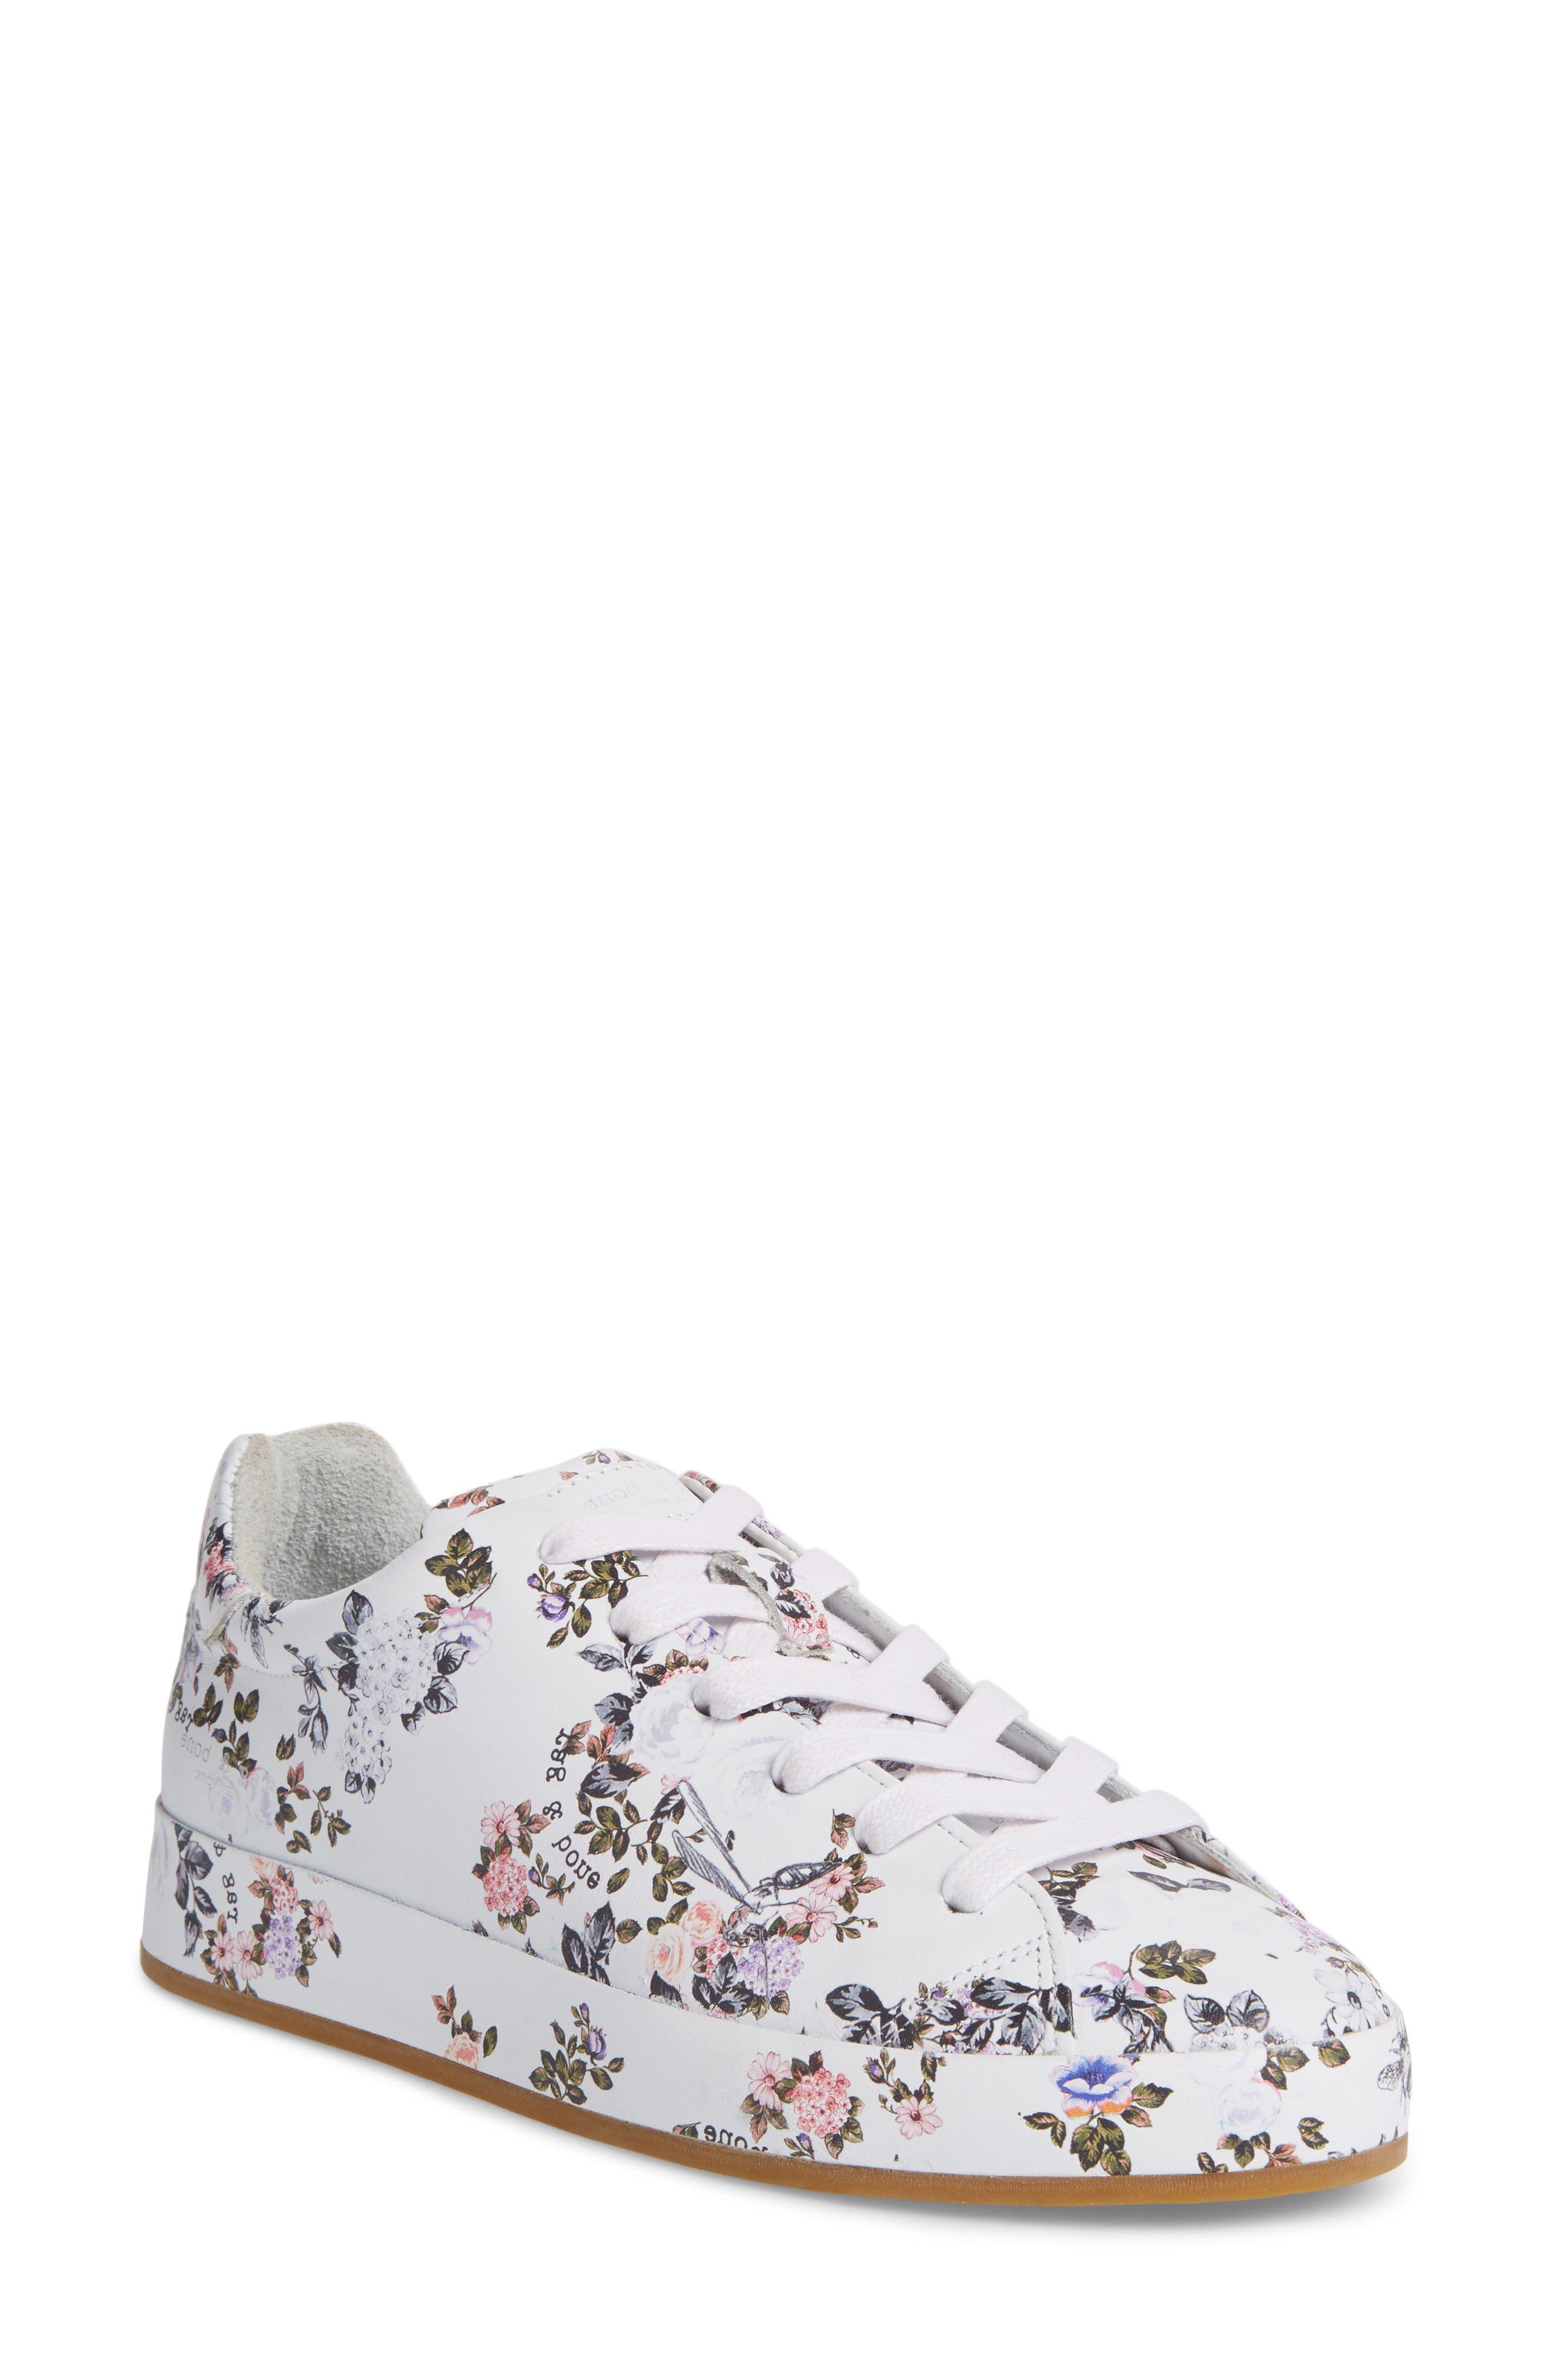 RB1 Low-Top Sneaker,                             Main thumbnail 1, color,                             Garden Florl